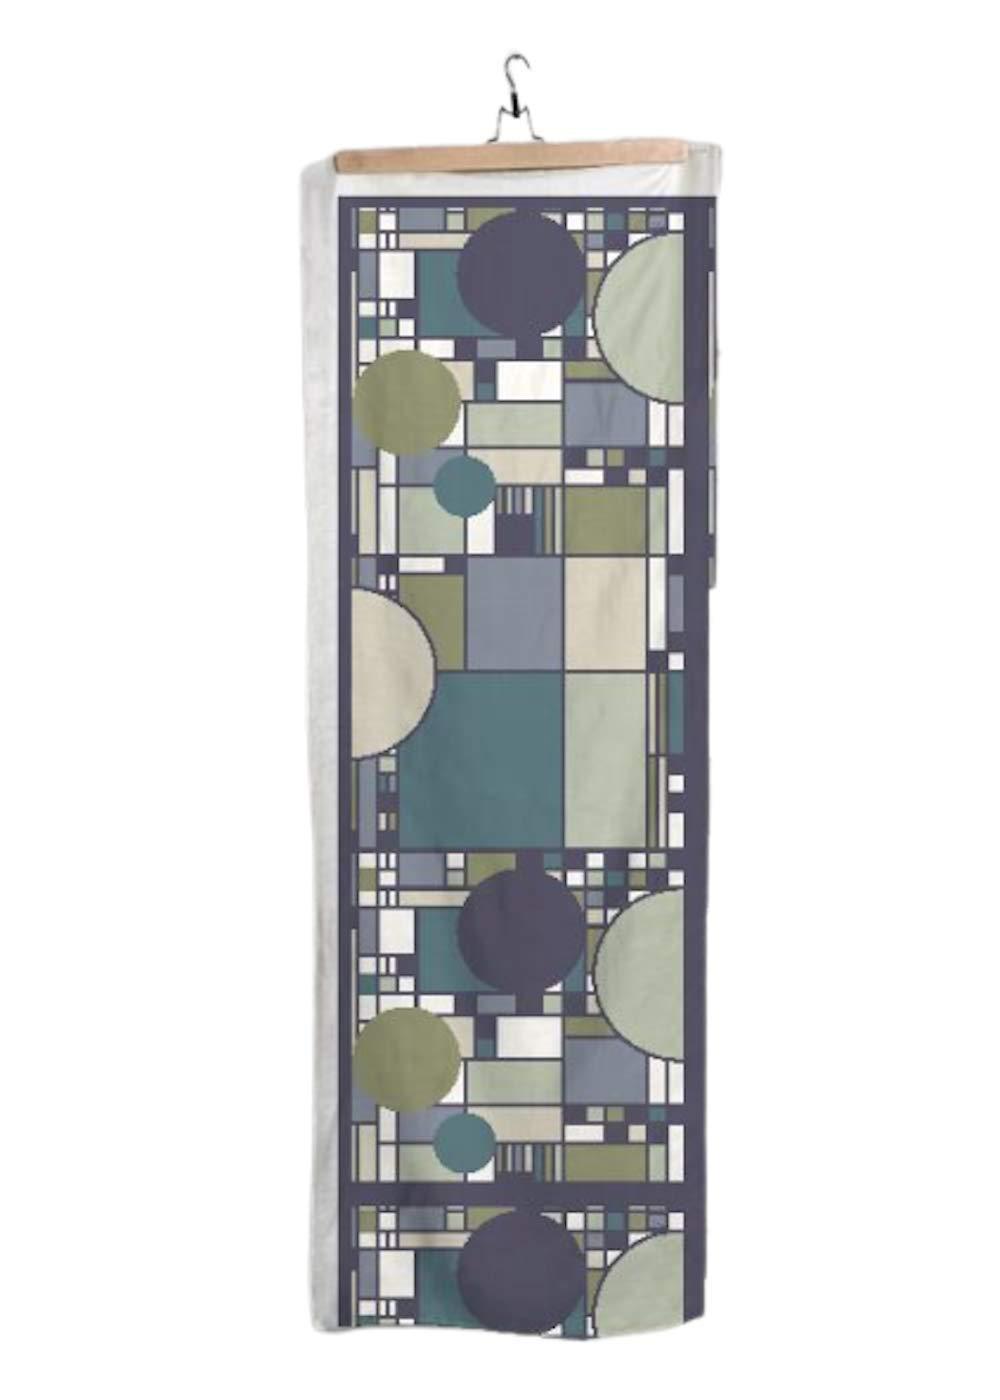 VIDA | Coonley Forest Scarf | Original Artwork Designed by Frank Lloyd Wright by VIDA